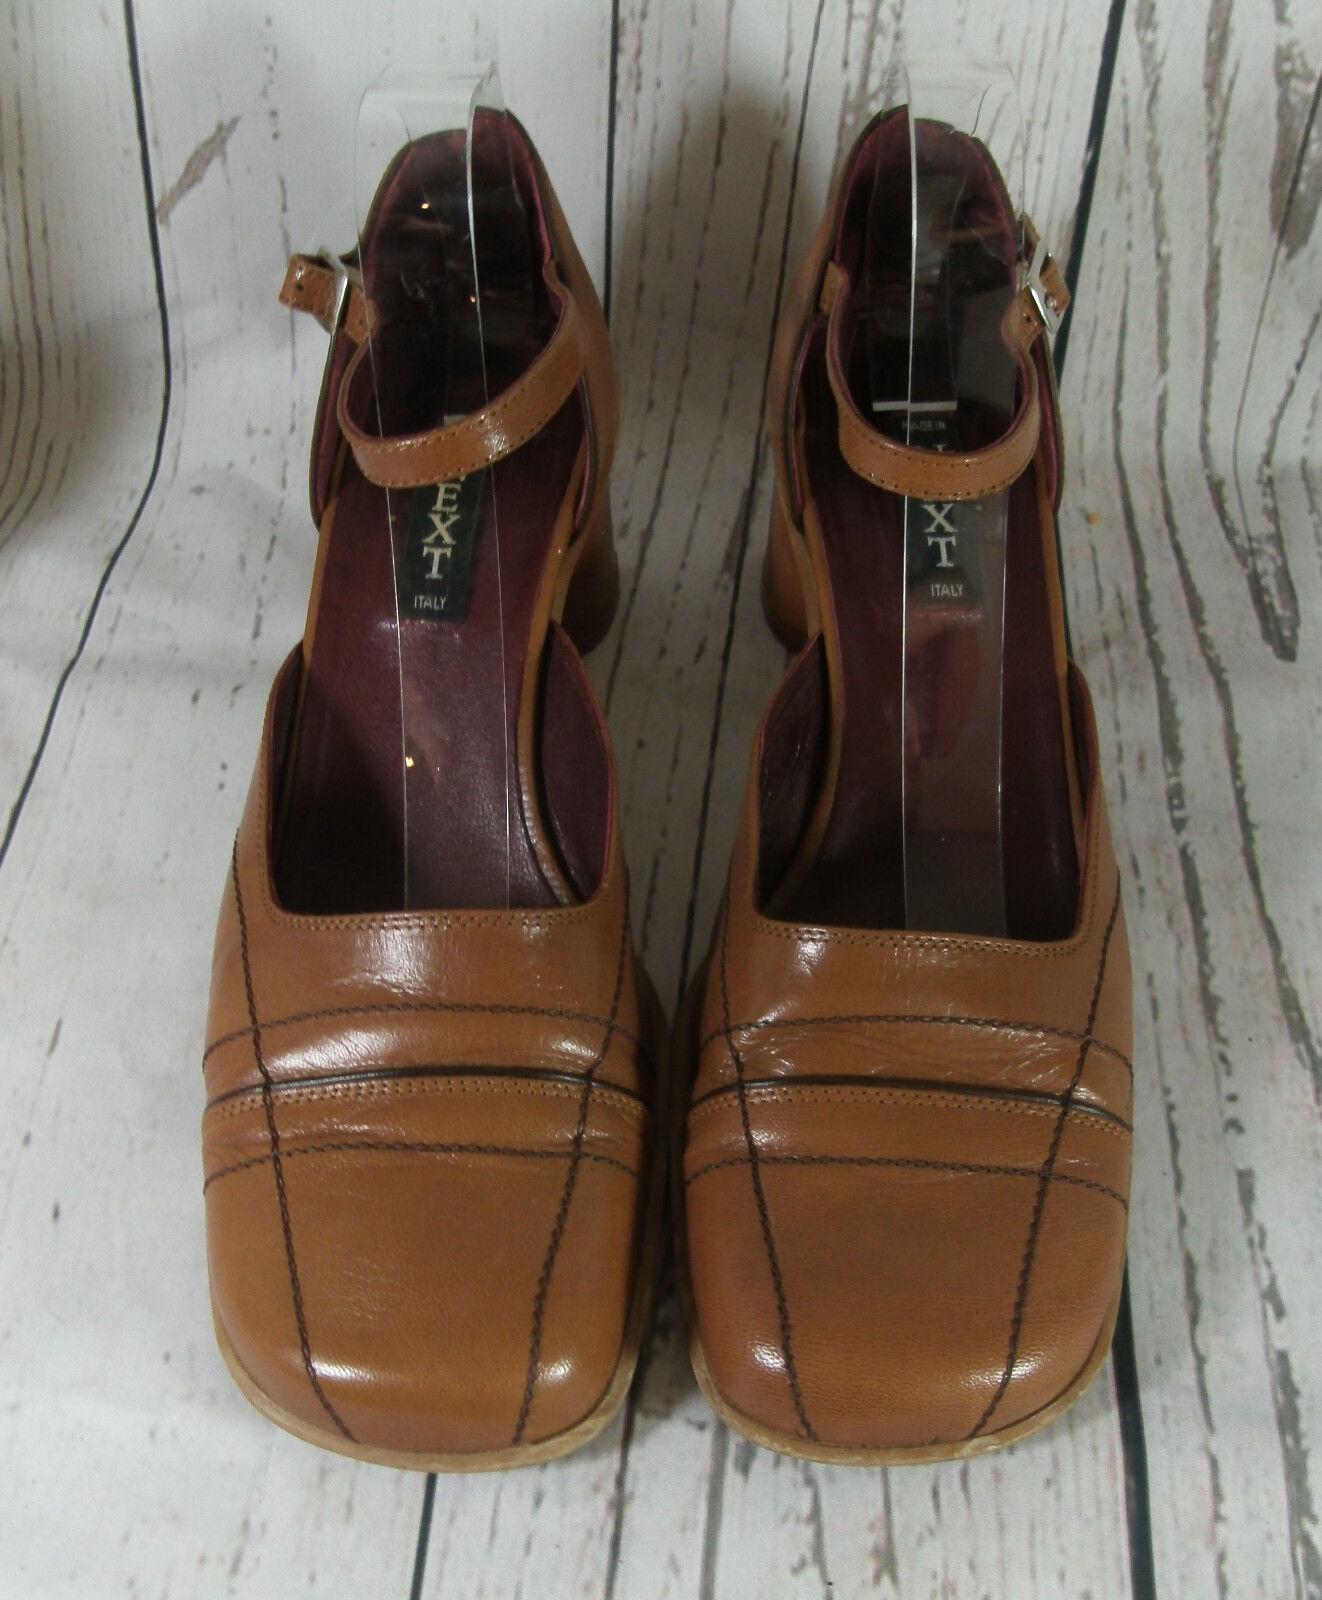 Vintage Next Tan Shoes Leather Mary Jane Style Shoes Tan c0d667